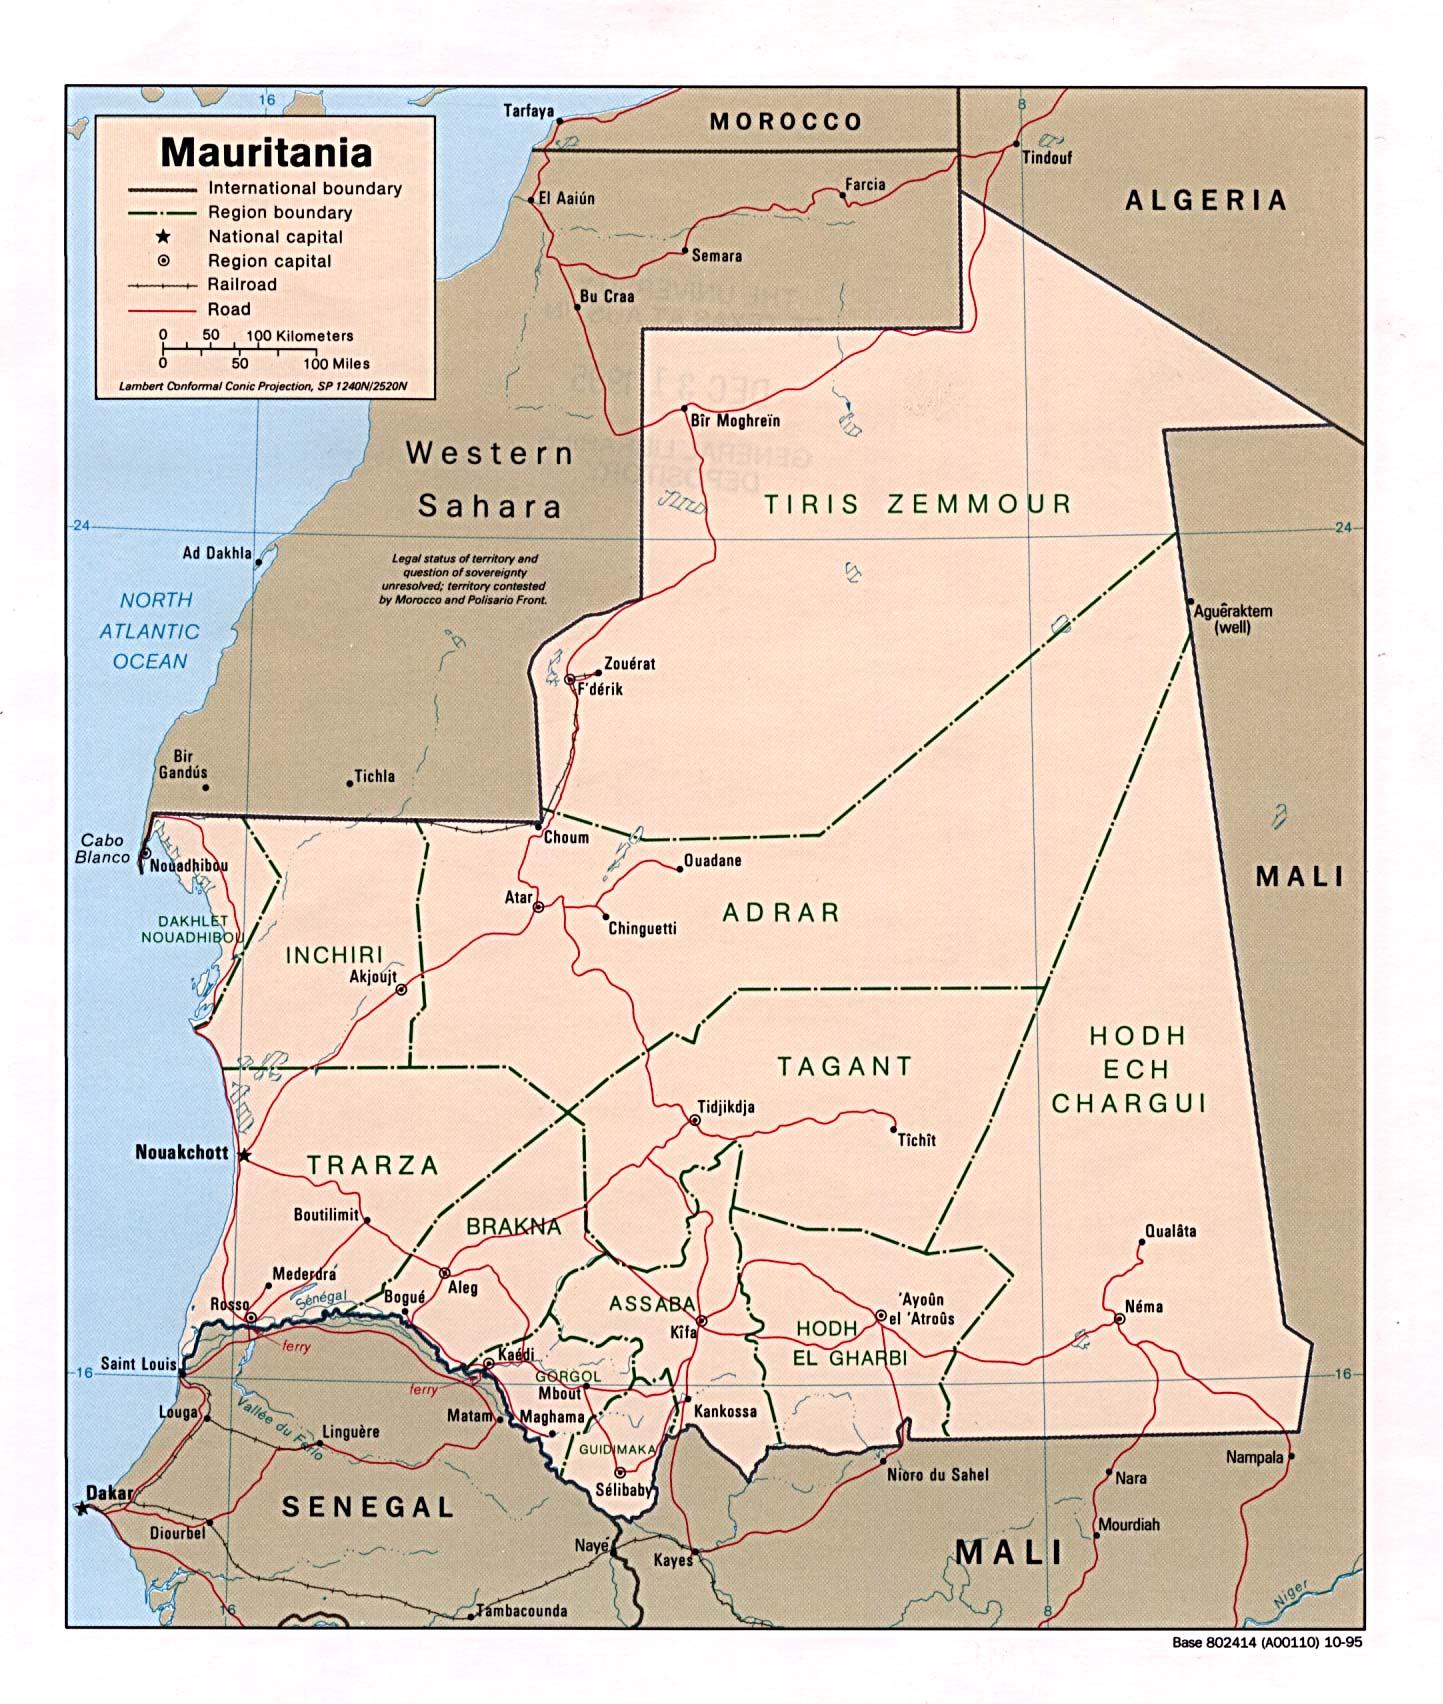 Map Of Mauritania Mauritania [Political Map] 1995 (396K)